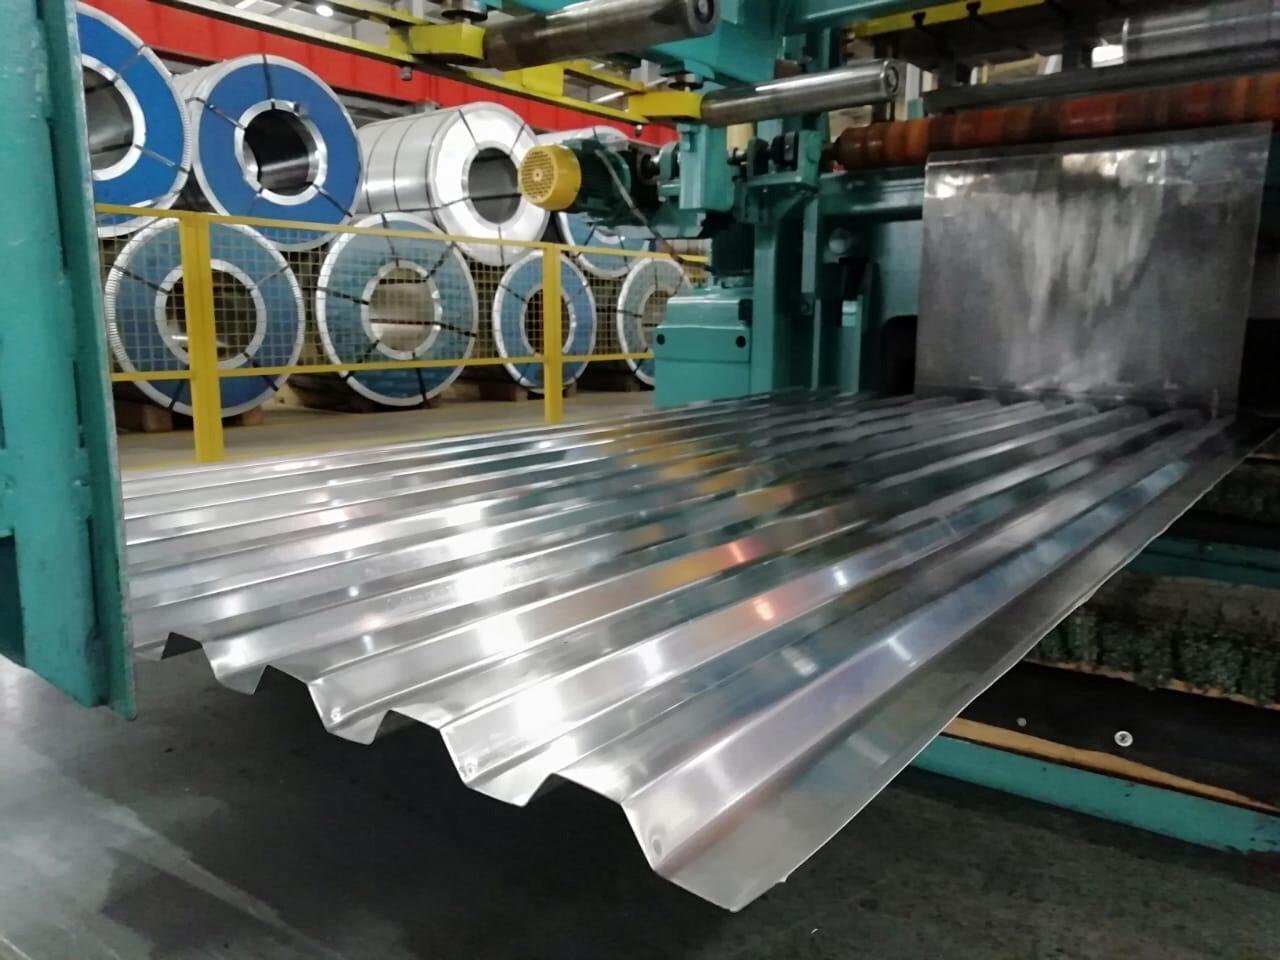 ООО «Регион Сталь» производит профнастил из алюминия АМГ2М, АД1Н, АМГ2Н, АД1Н2.